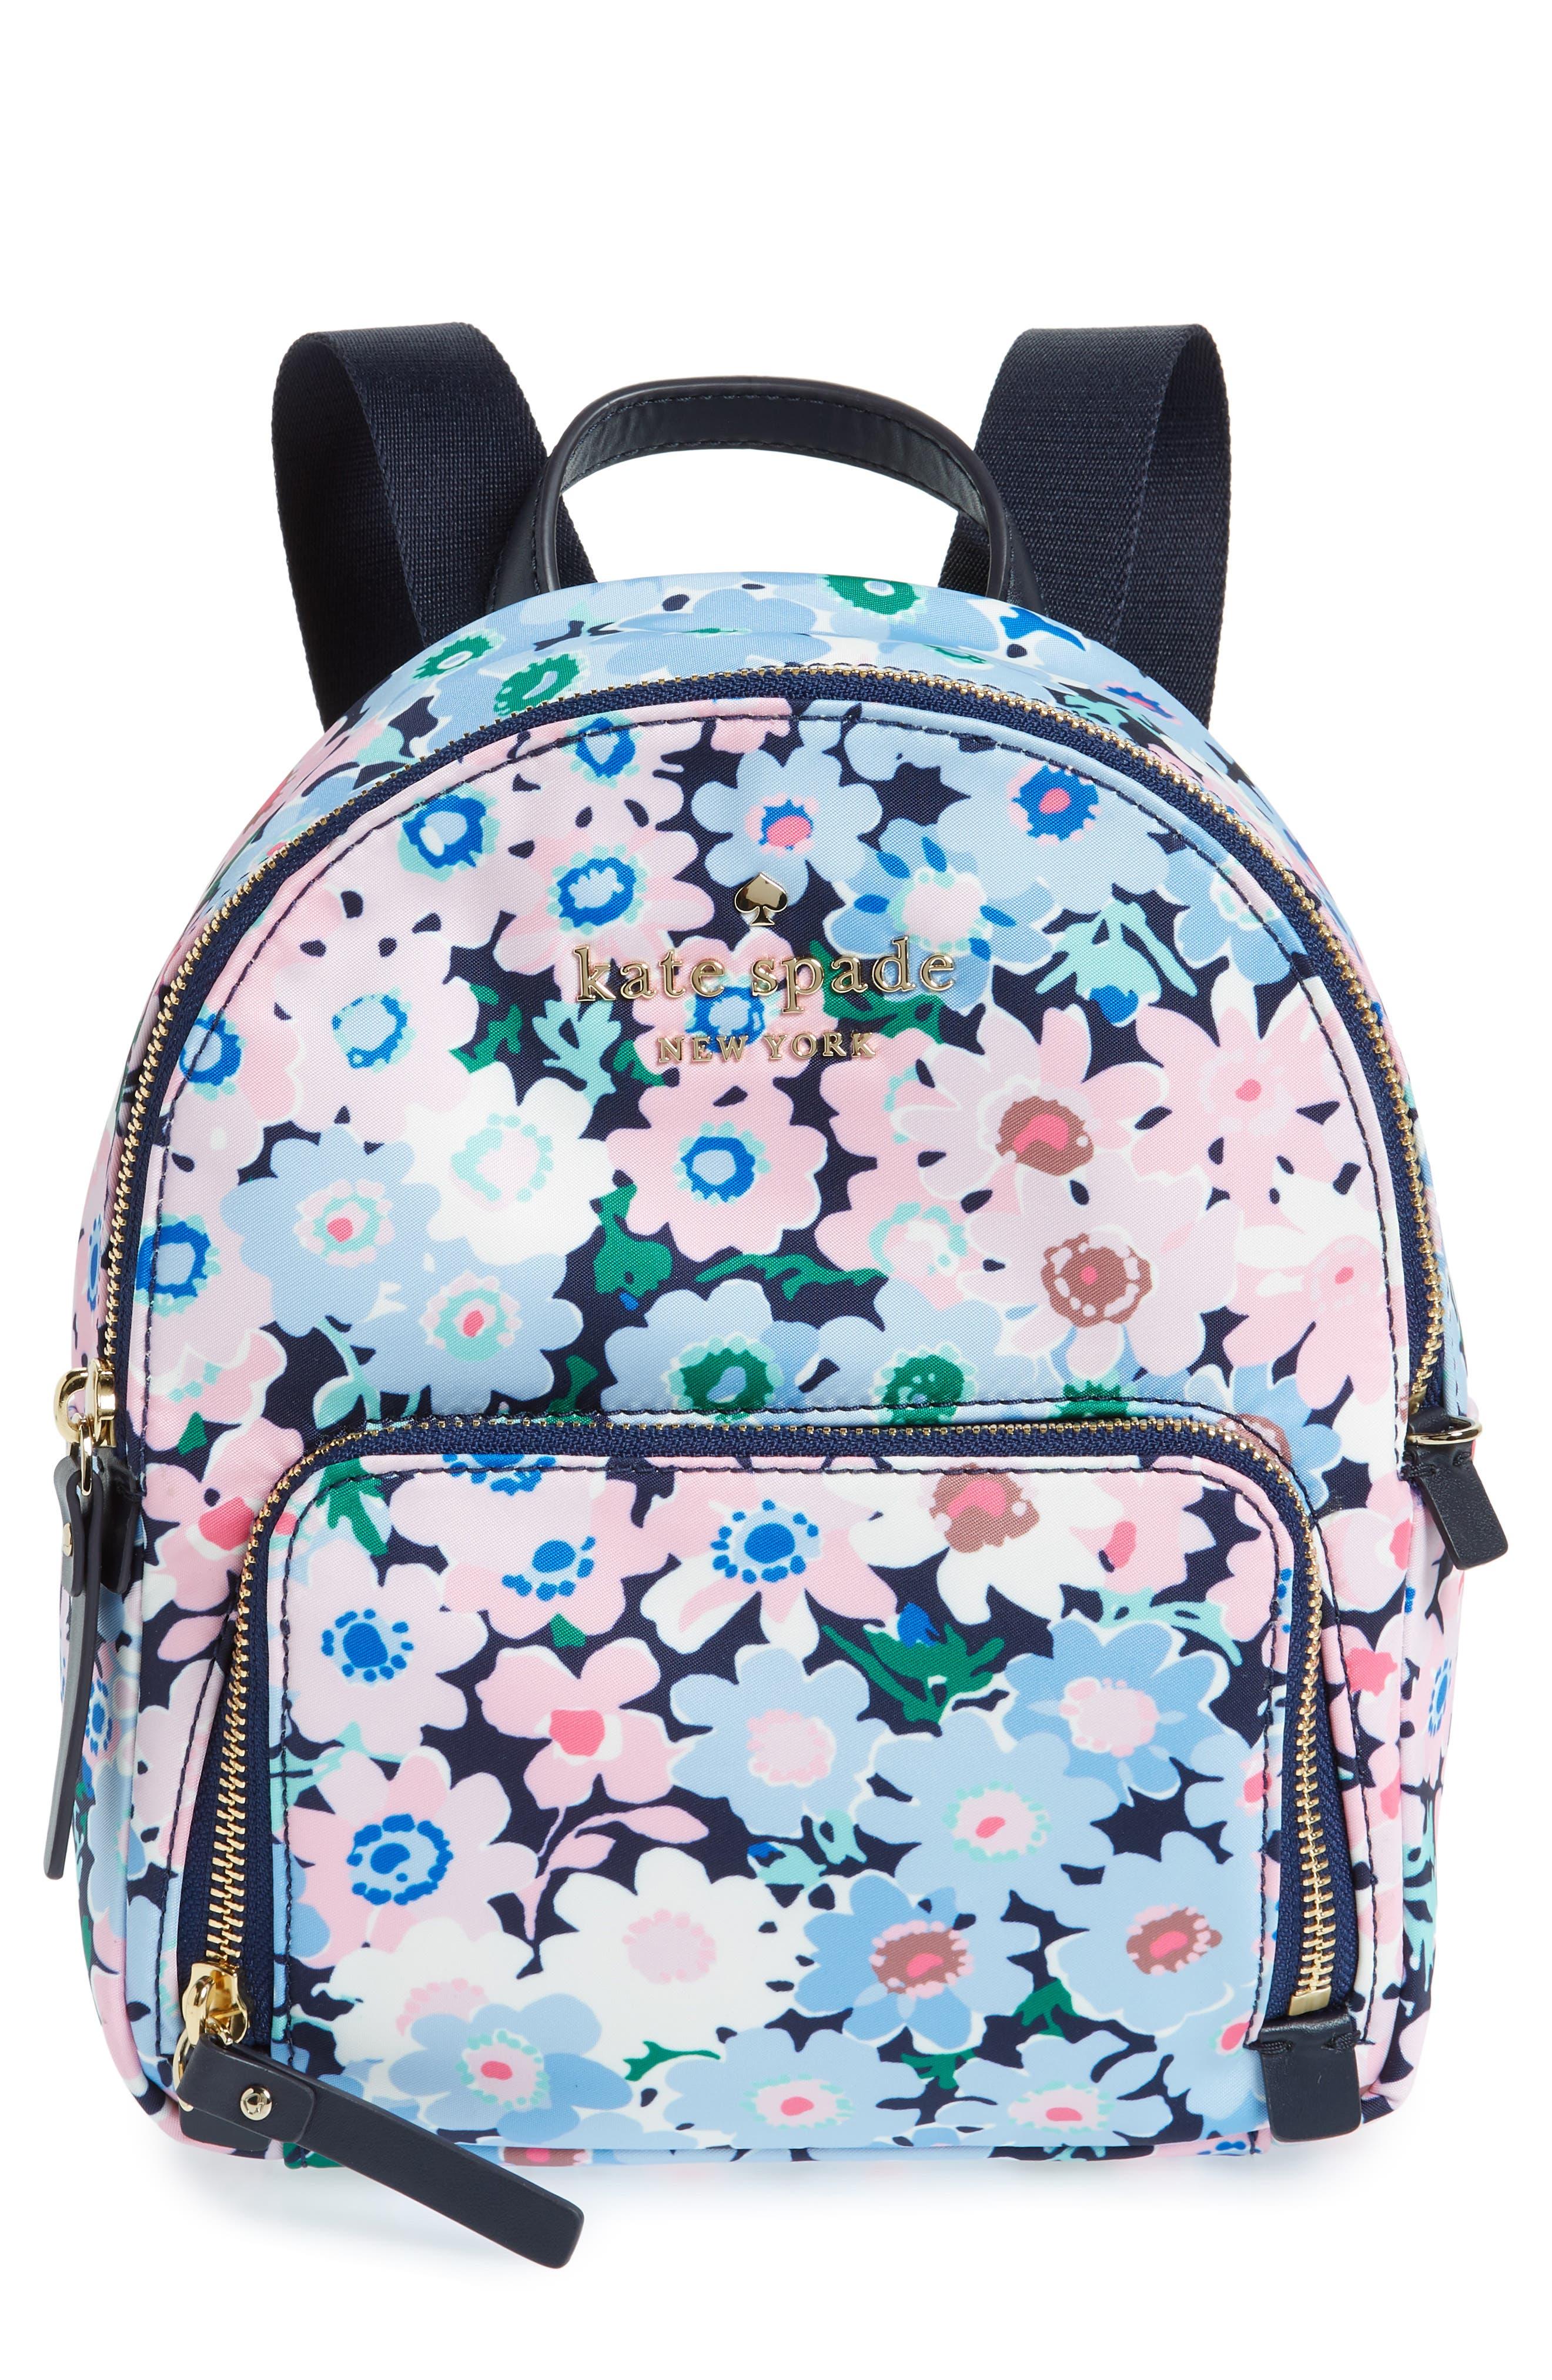 watson lane - daisy garden small hartley backpack,                             Main thumbnail 1, color,                             Blue Multi